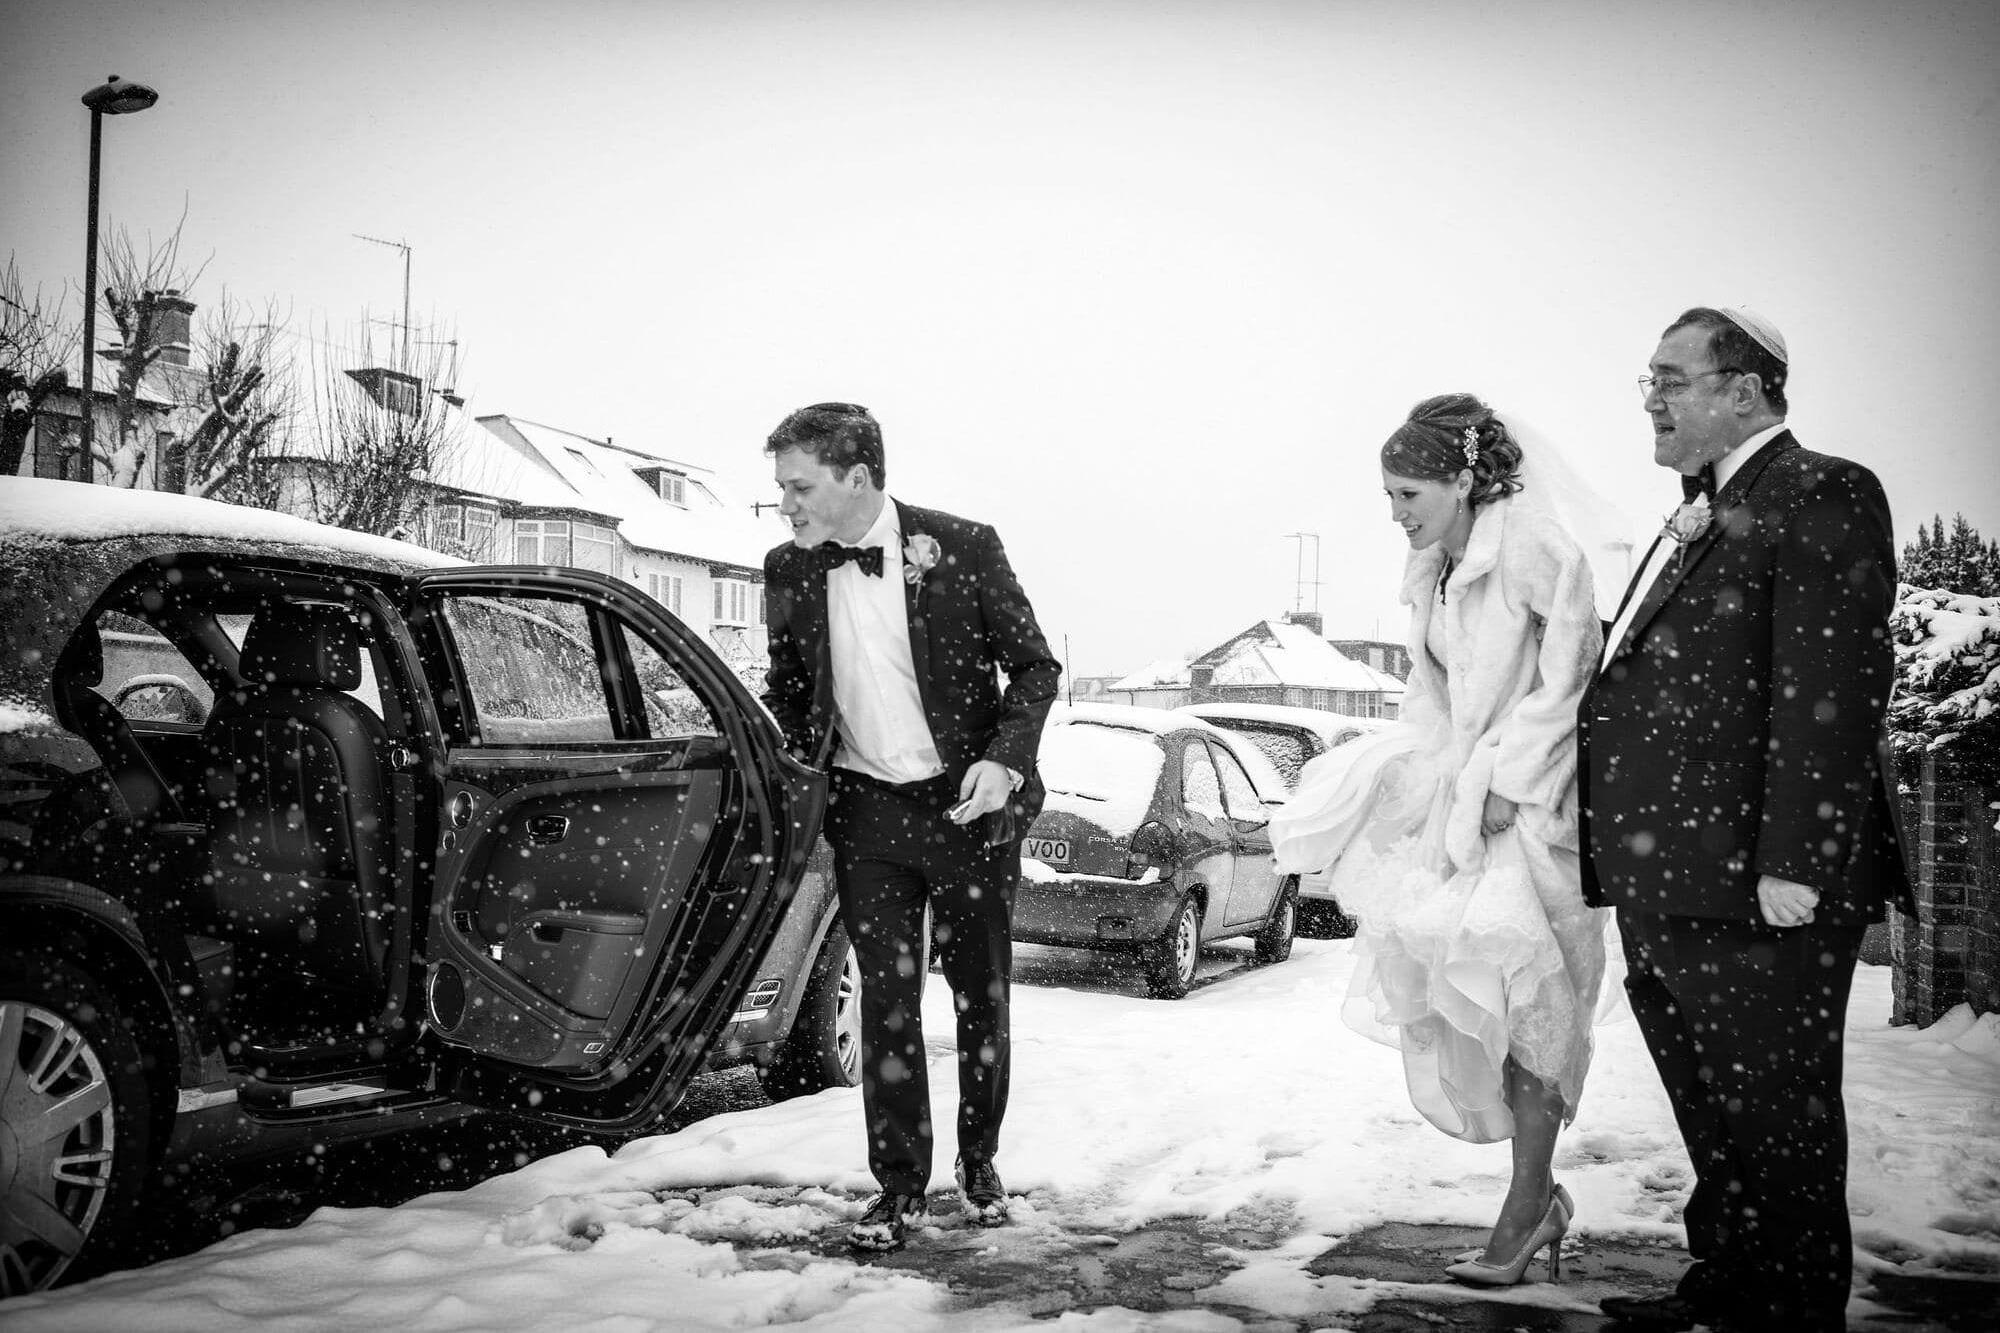 Mark-Seymour-Wedding-Photographer-UK-14 11